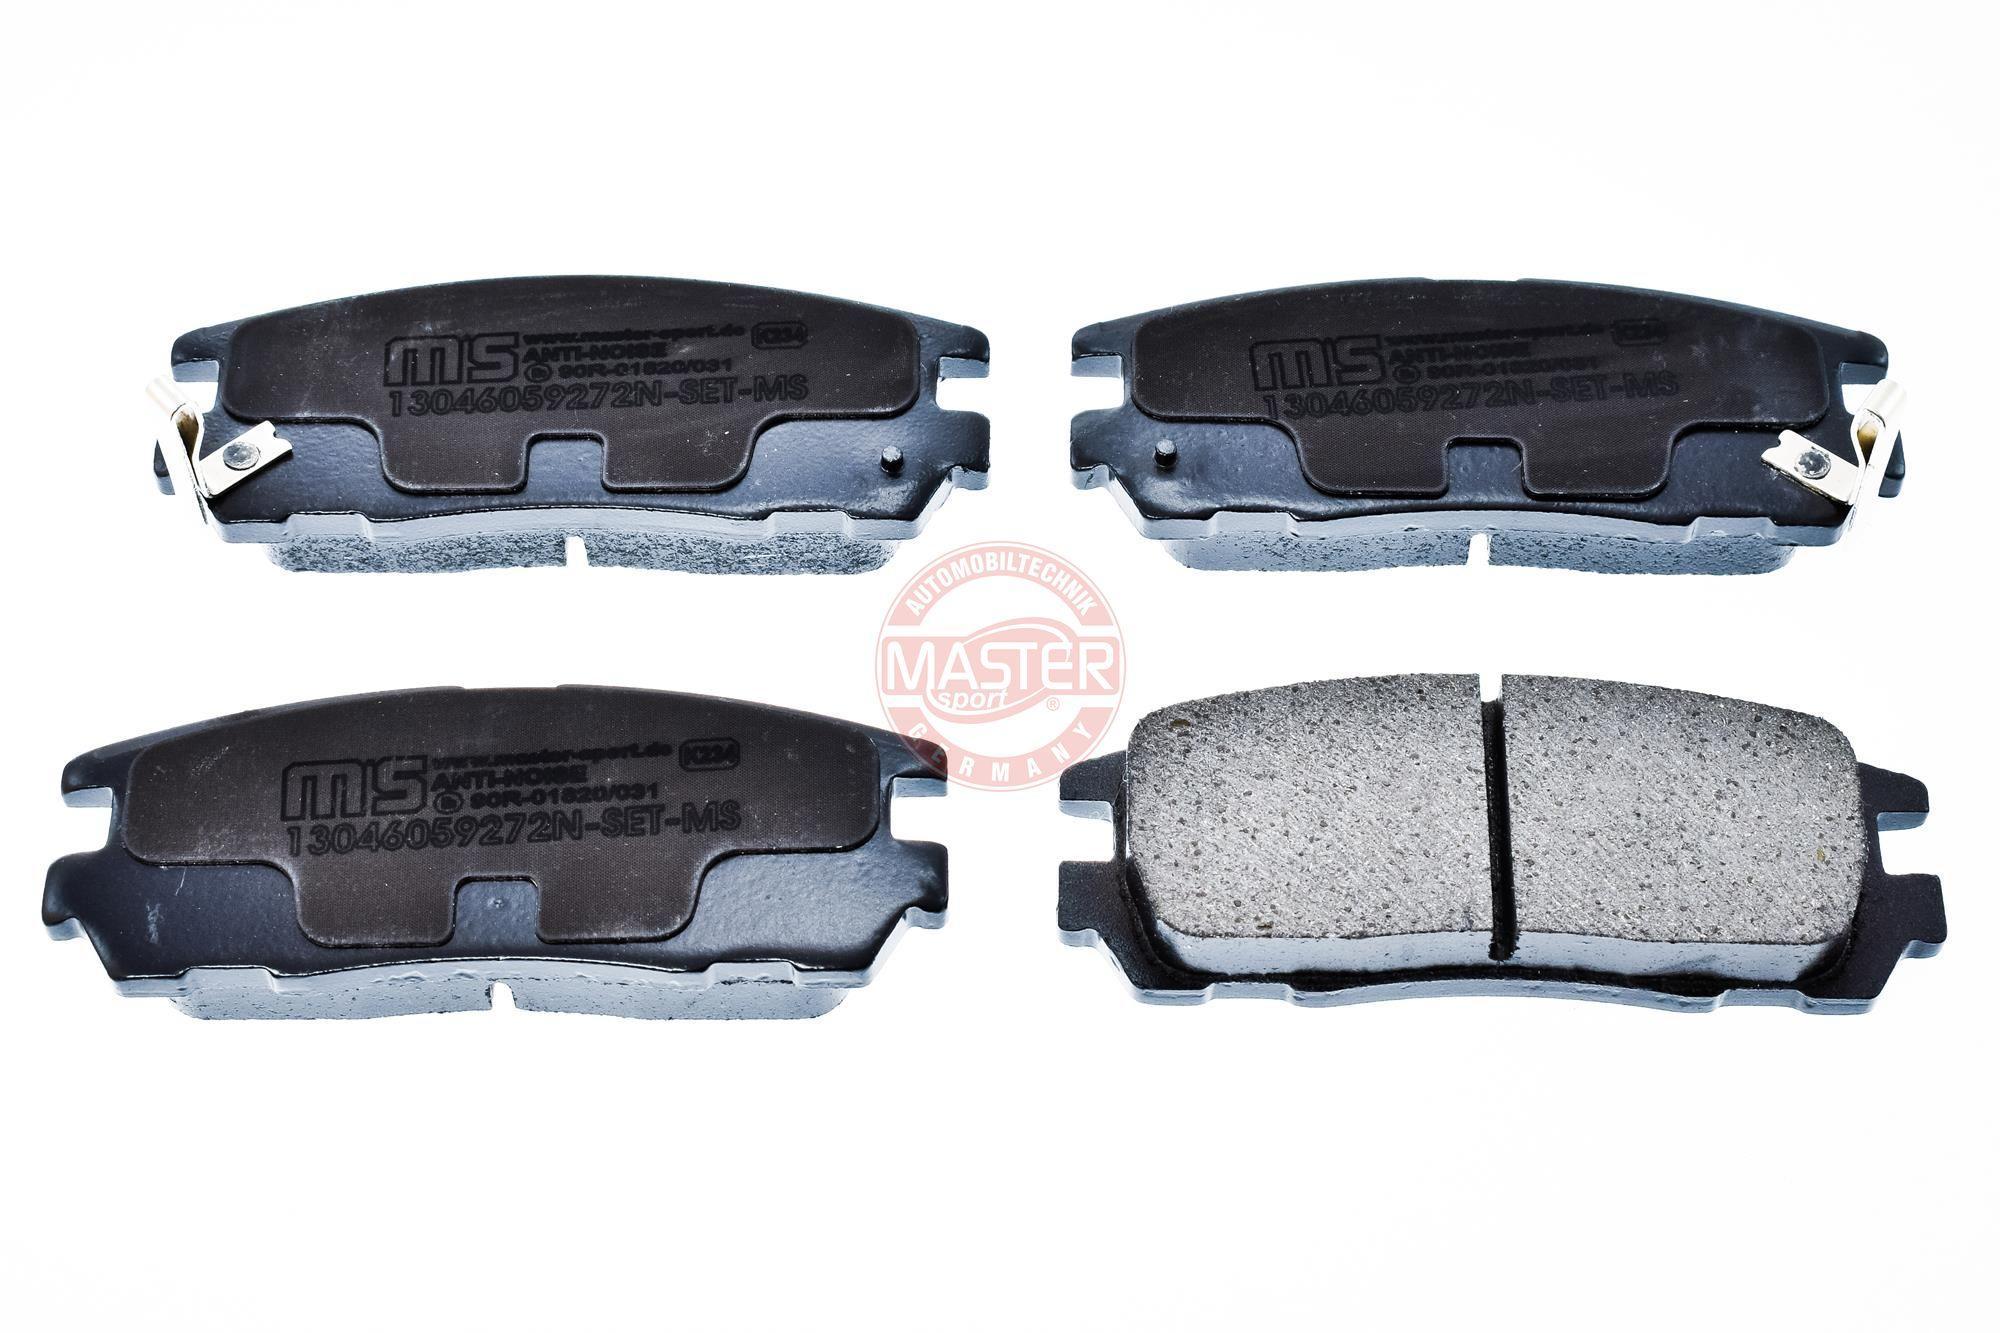 Bremsbelagsatz MASTER-SPORT 13046059272N-SET-MS